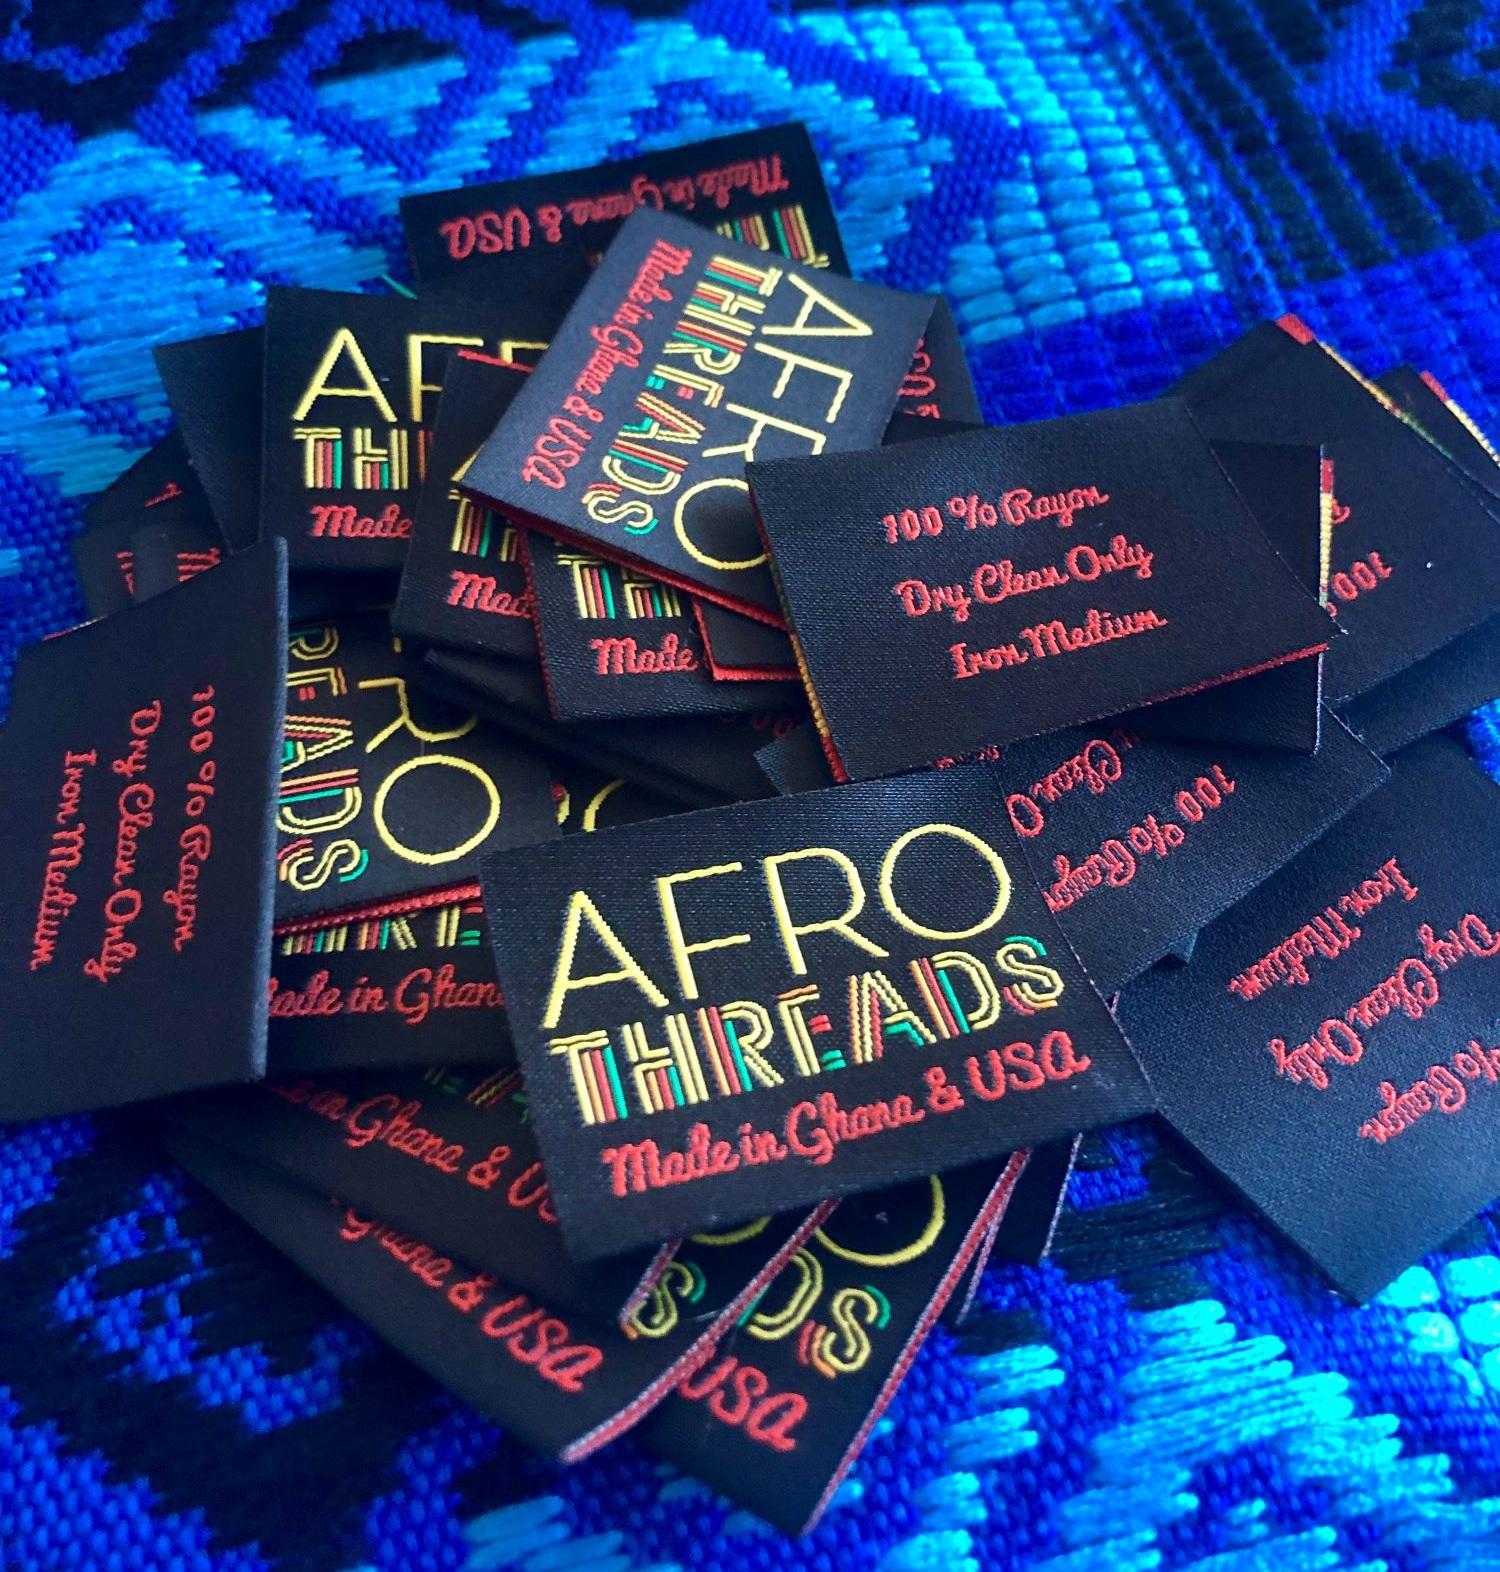 afrothreads-brand-labels.jpg